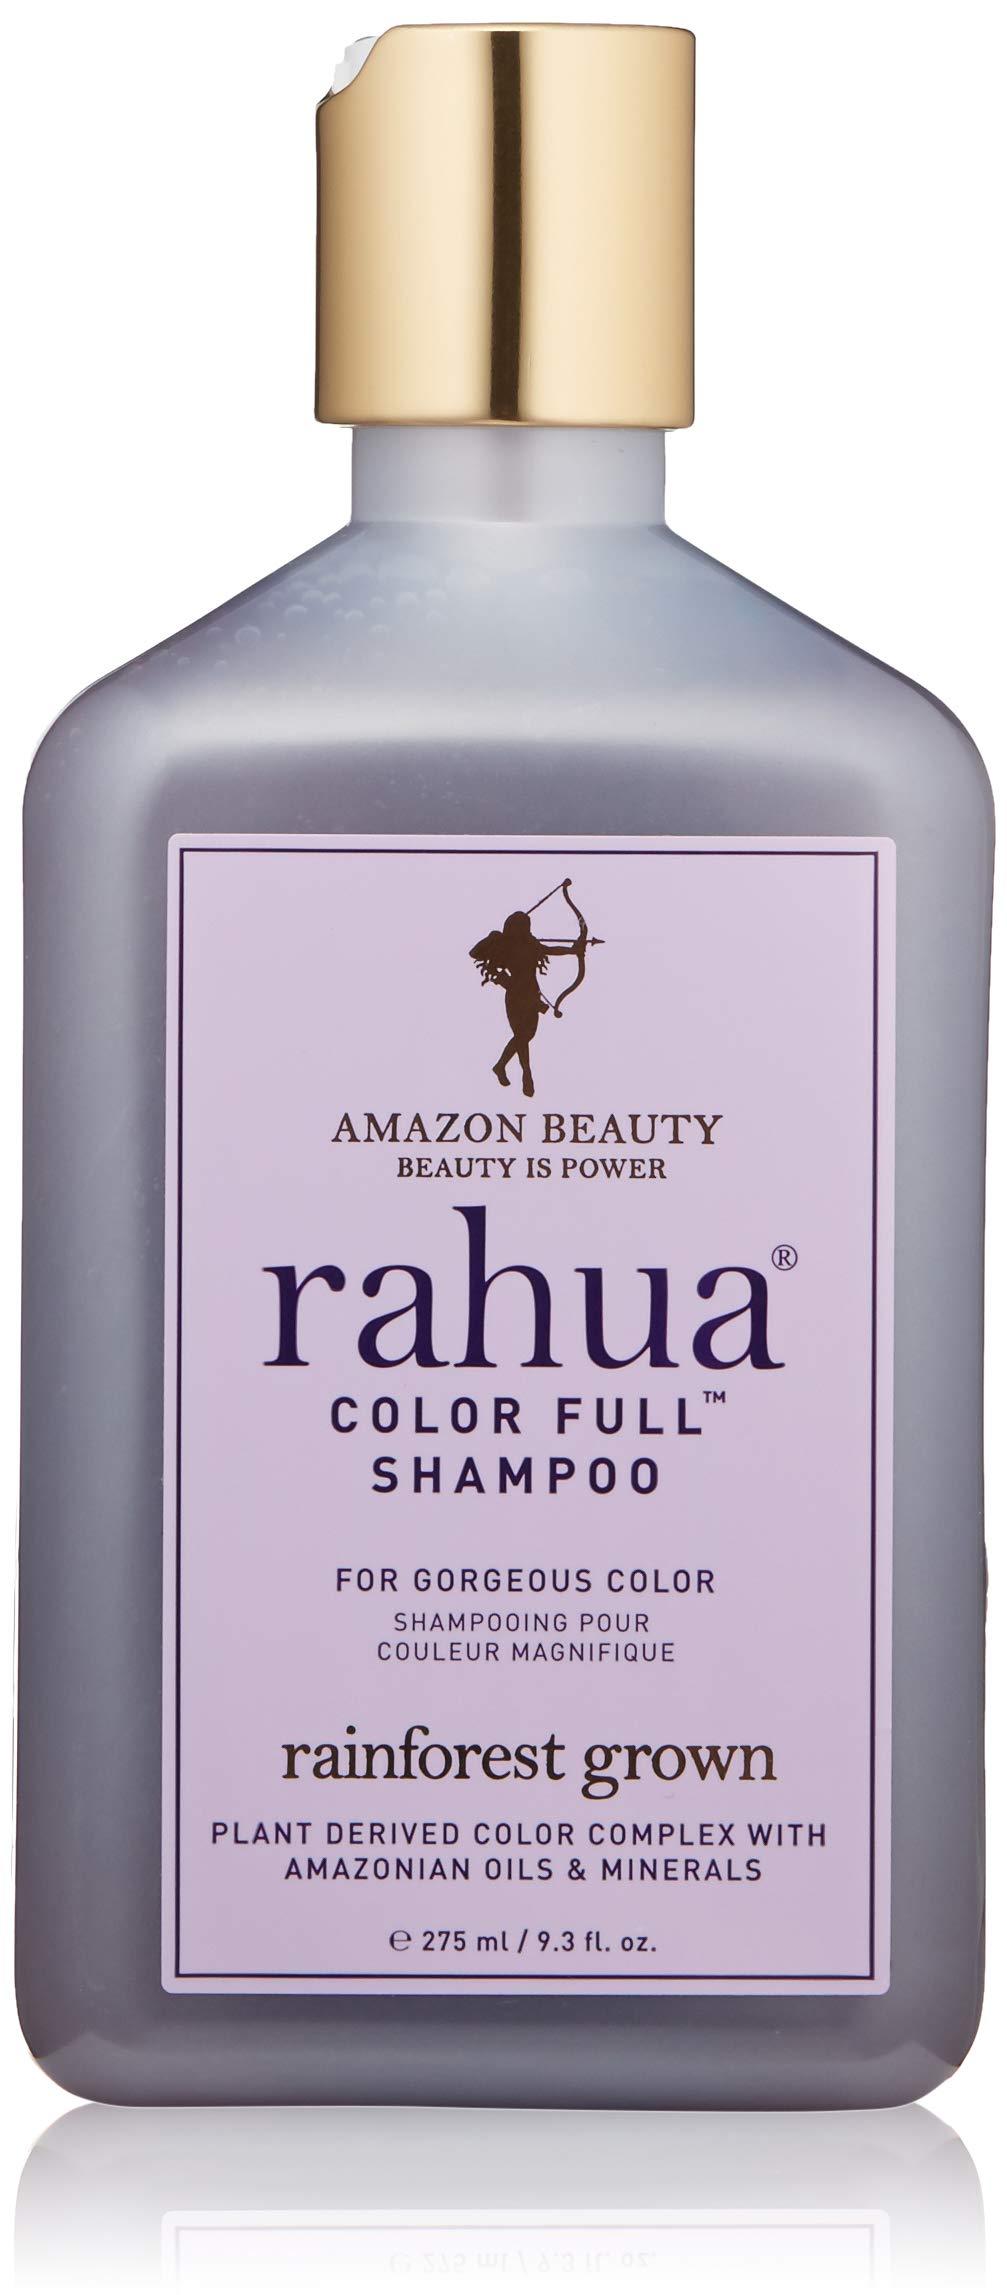 Rahua Color Full Shampoo, 9.3 Fl Oz by Rahua